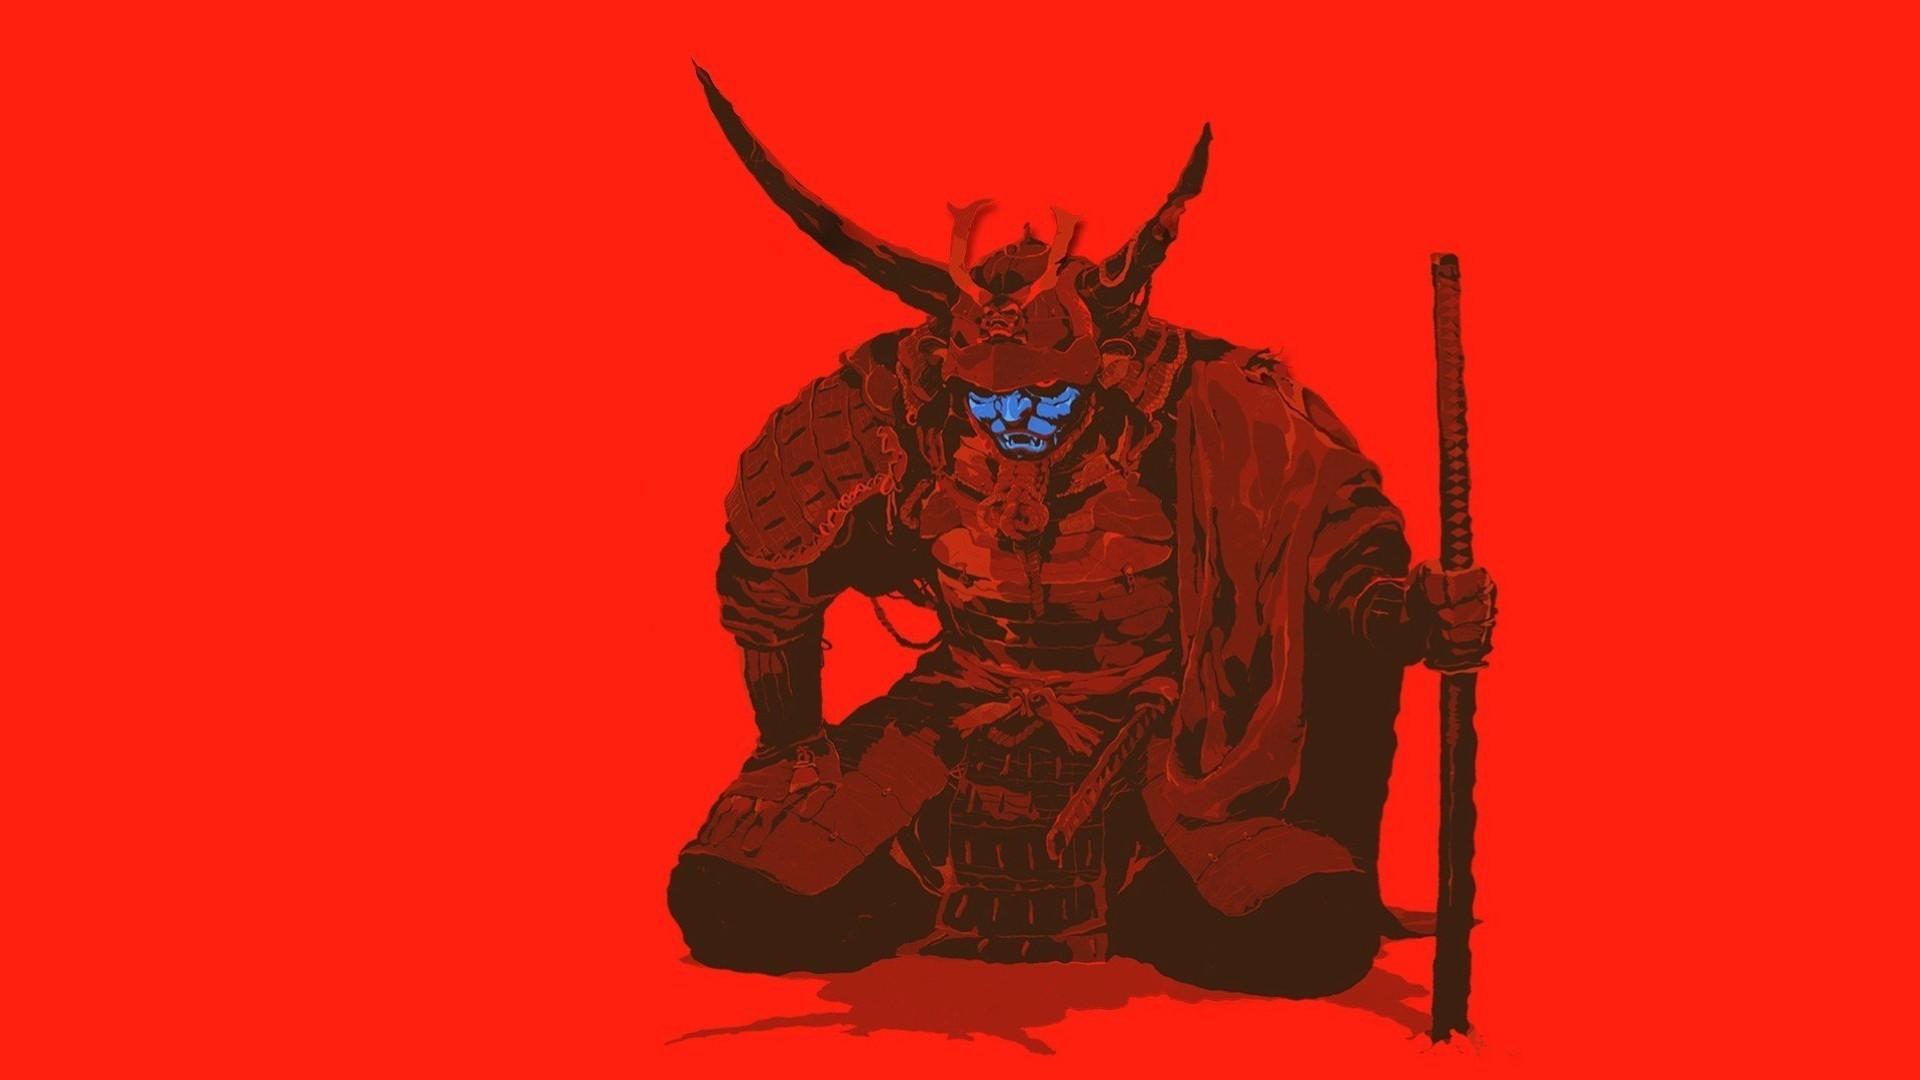 minimalism, artwork, simple background, samurai, sword wallpapers